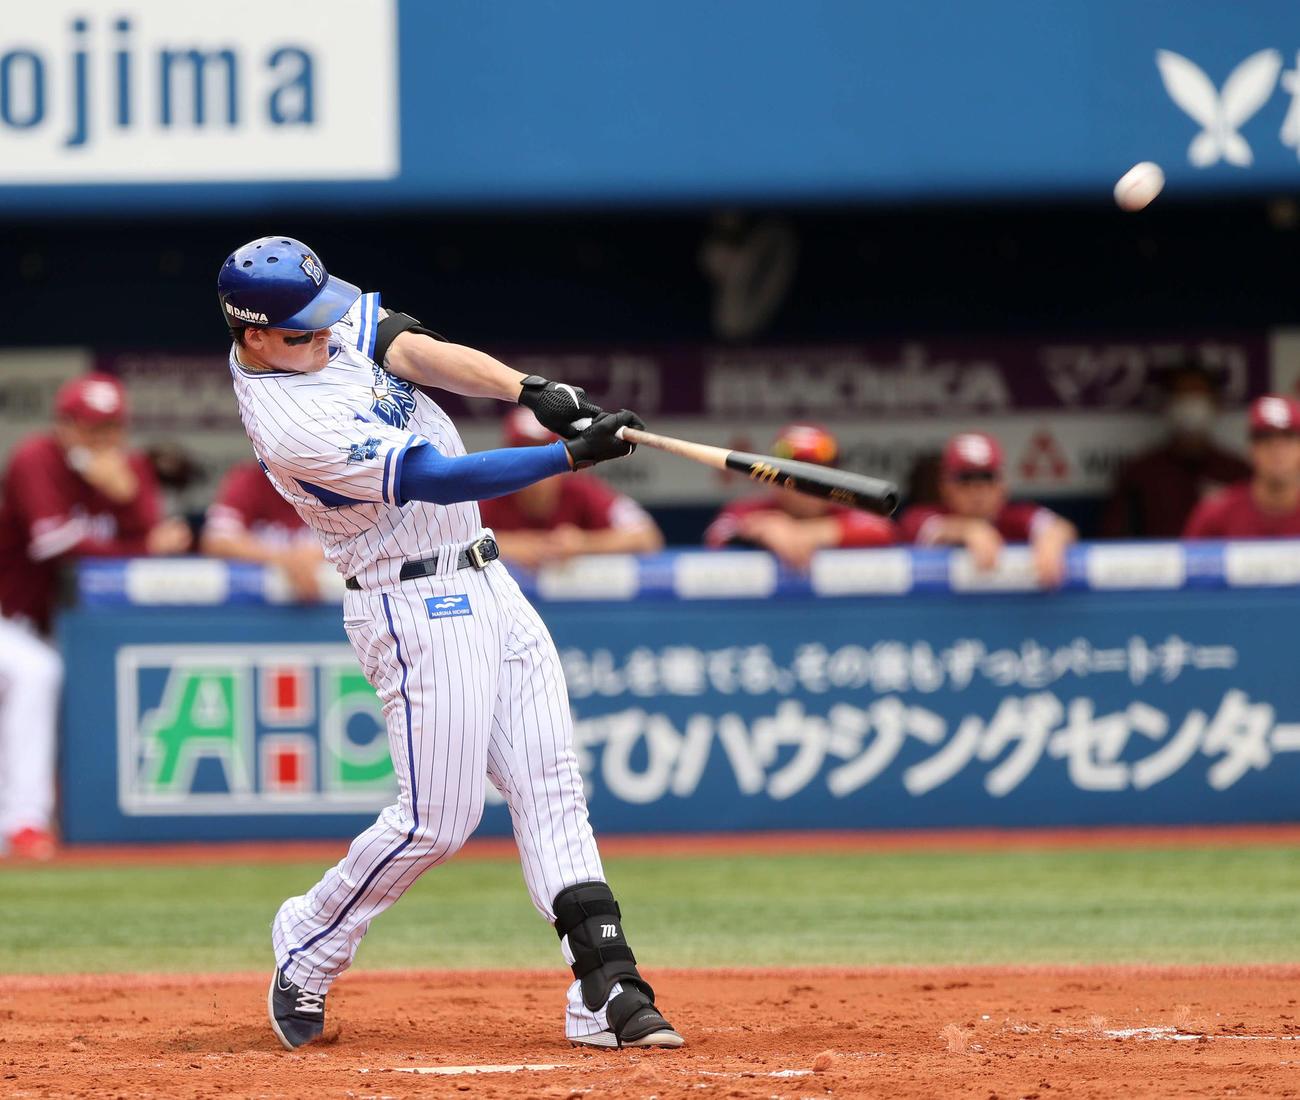 DeNA対楽天 3回裏DeNA1死二塁、勝ち越し2点本塁打を放つオースティン(撮影・江口和貴)